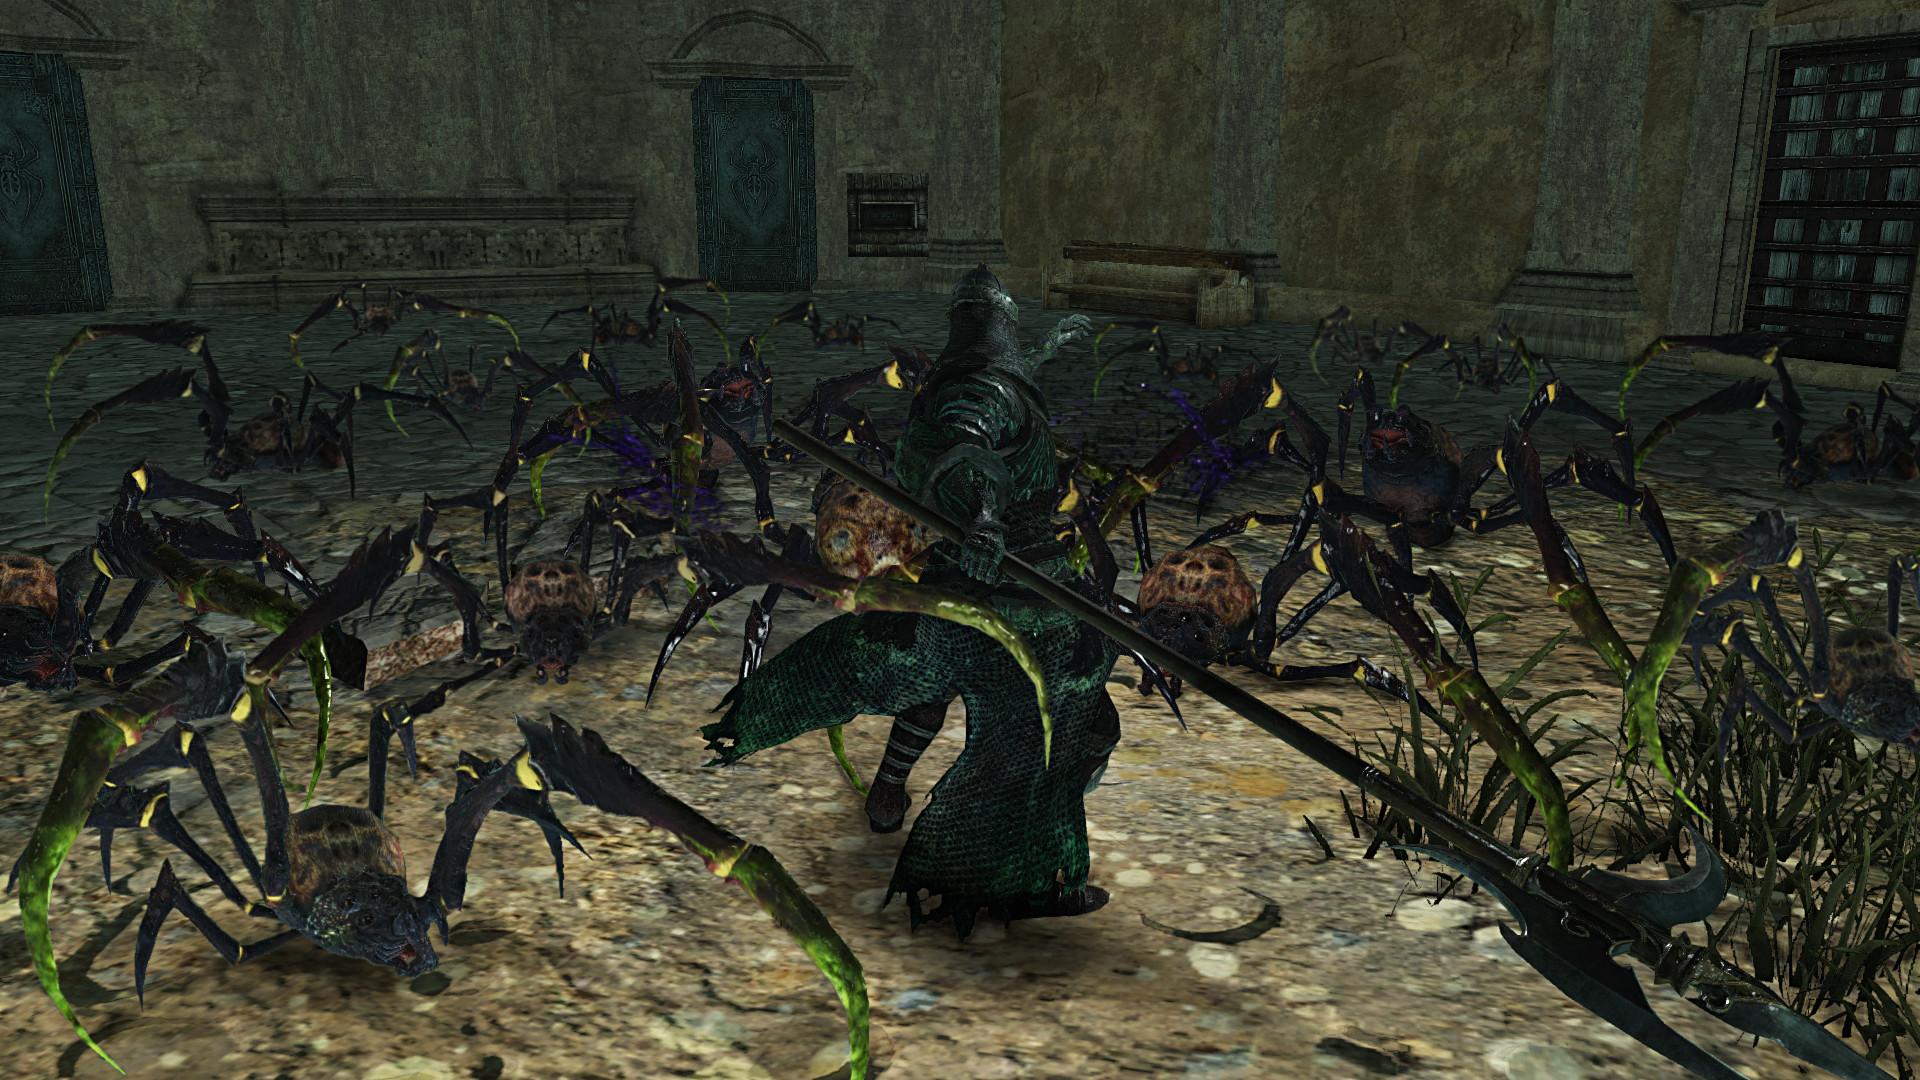 dark souls 2 pvp level